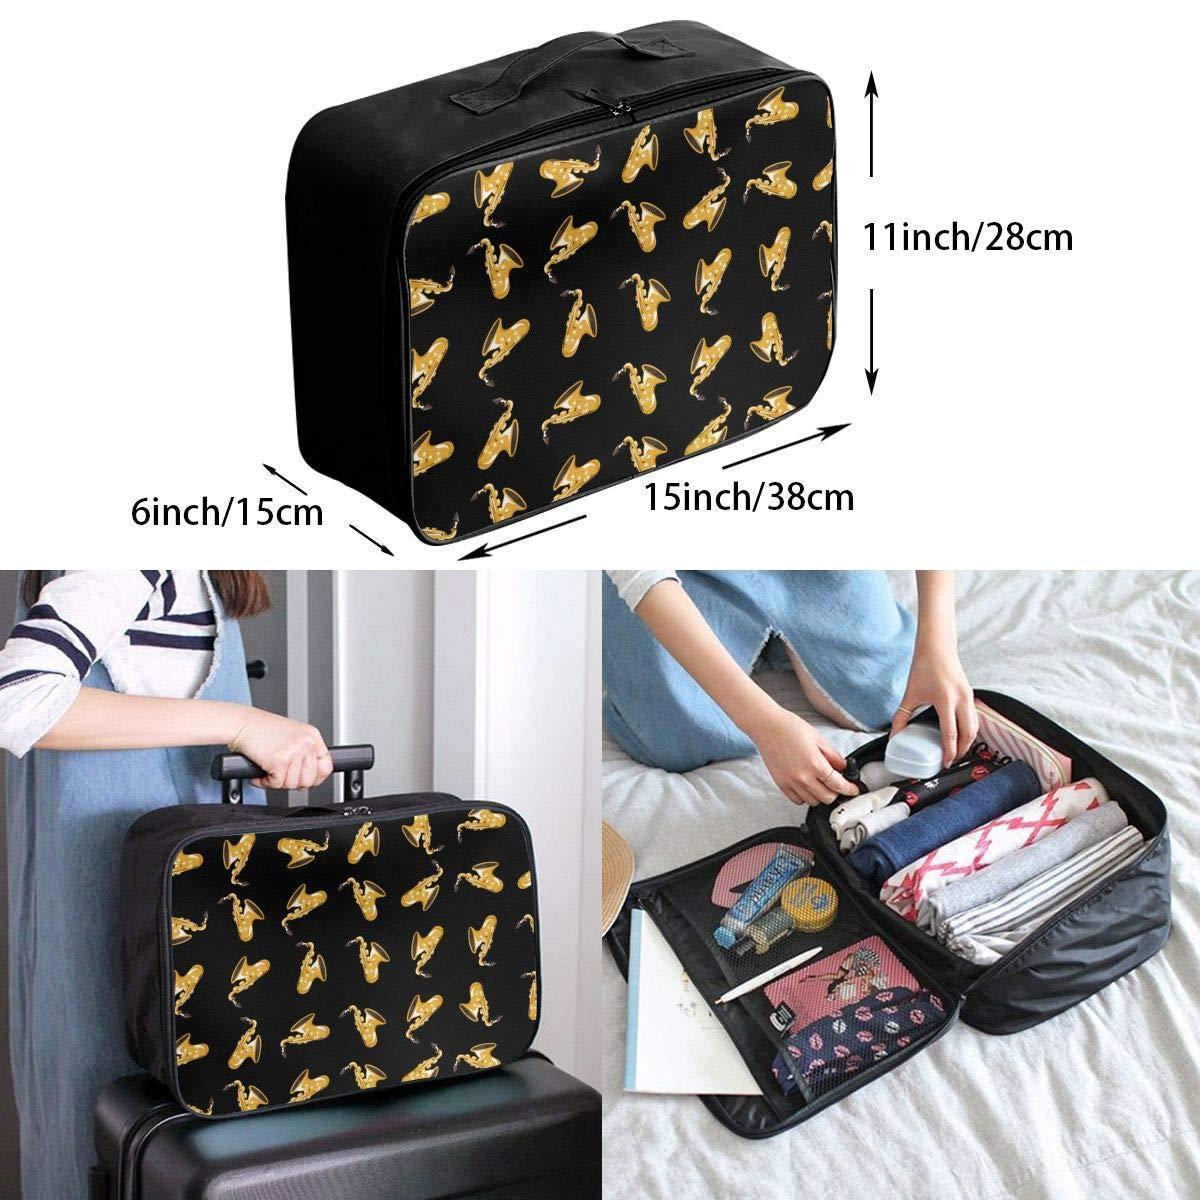 Travel Duffel Bag Waterproof Fashion Lightweight Large Capacity Portable Luggage Bag Music Saxophone Cartoon Black